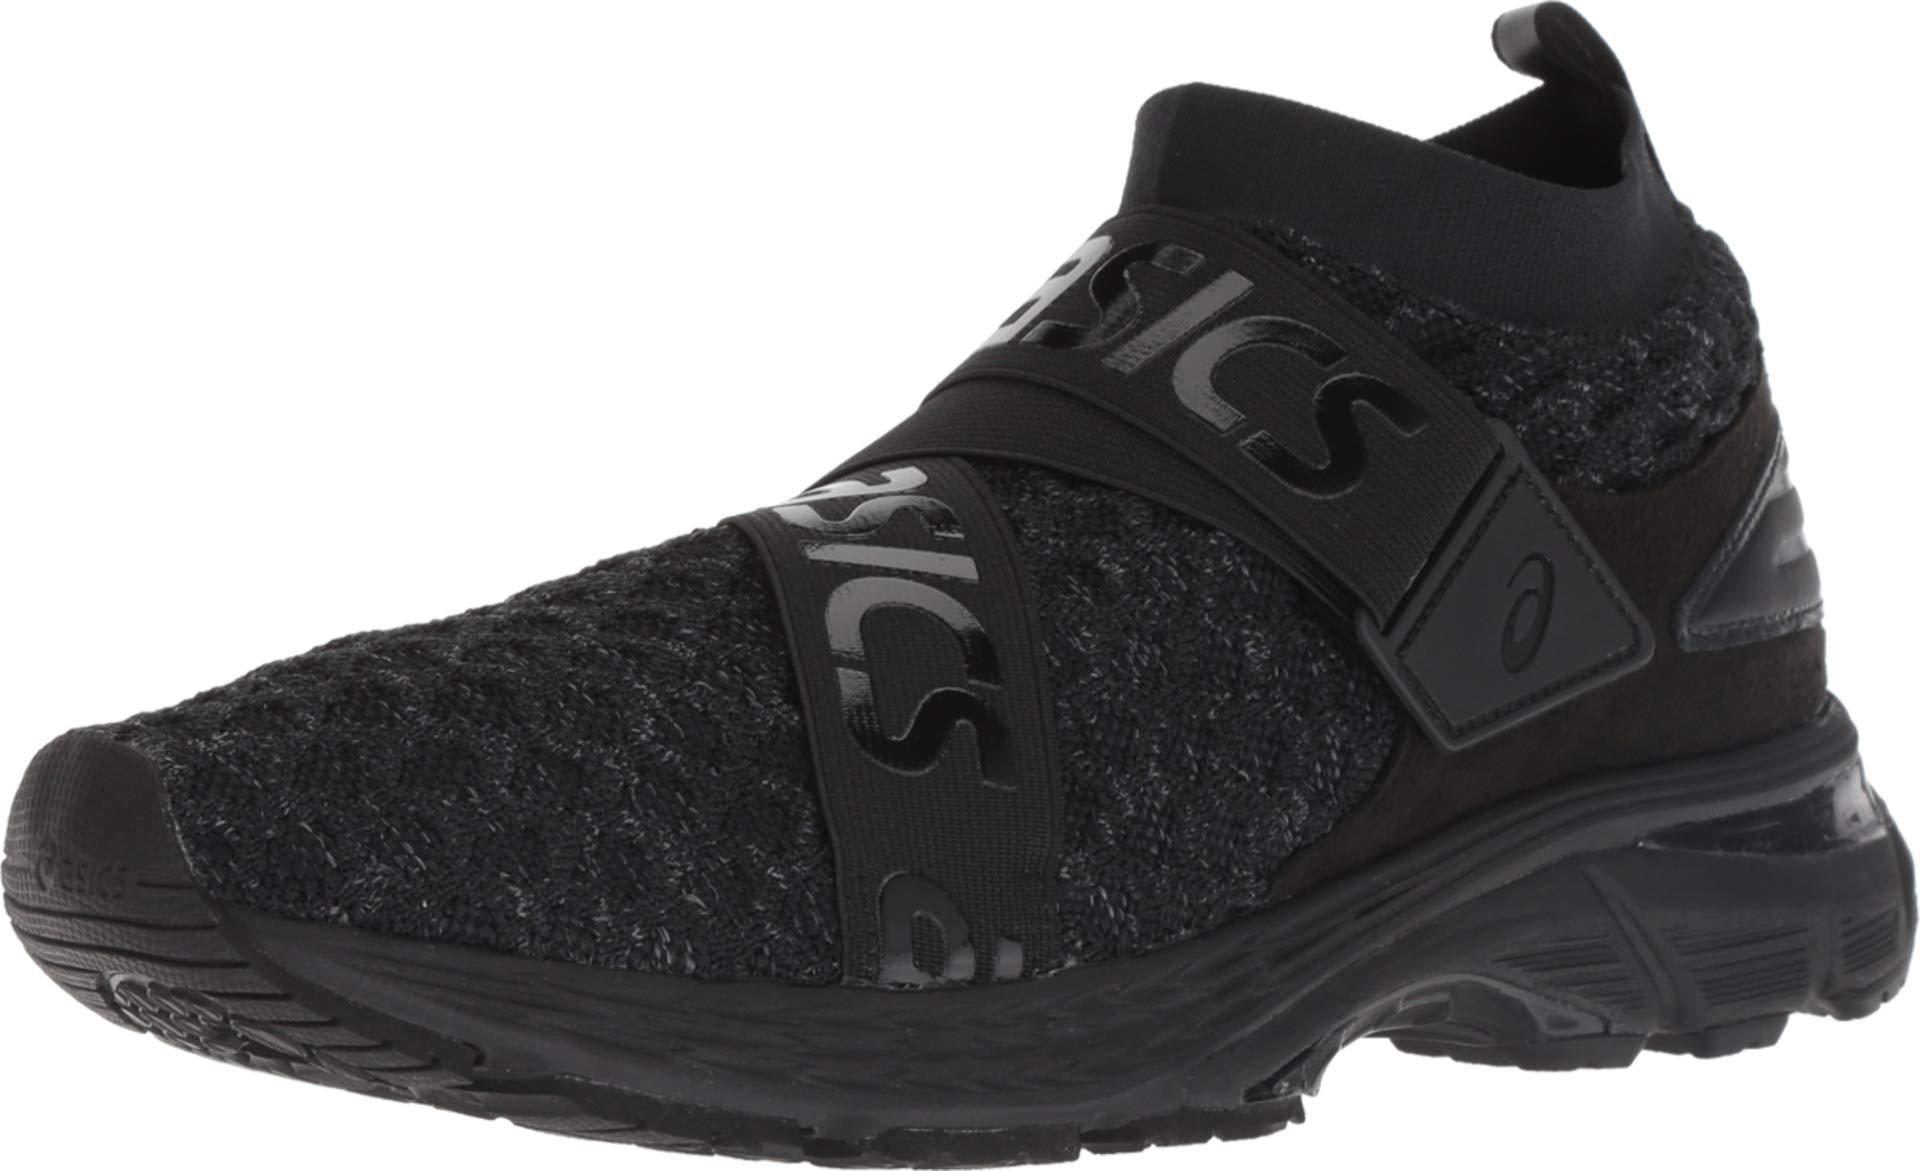 61fEMDeDl0L - ASICS Mens Gel-Kayano 25 Obistag Black/Carbon Running Shoe - 9